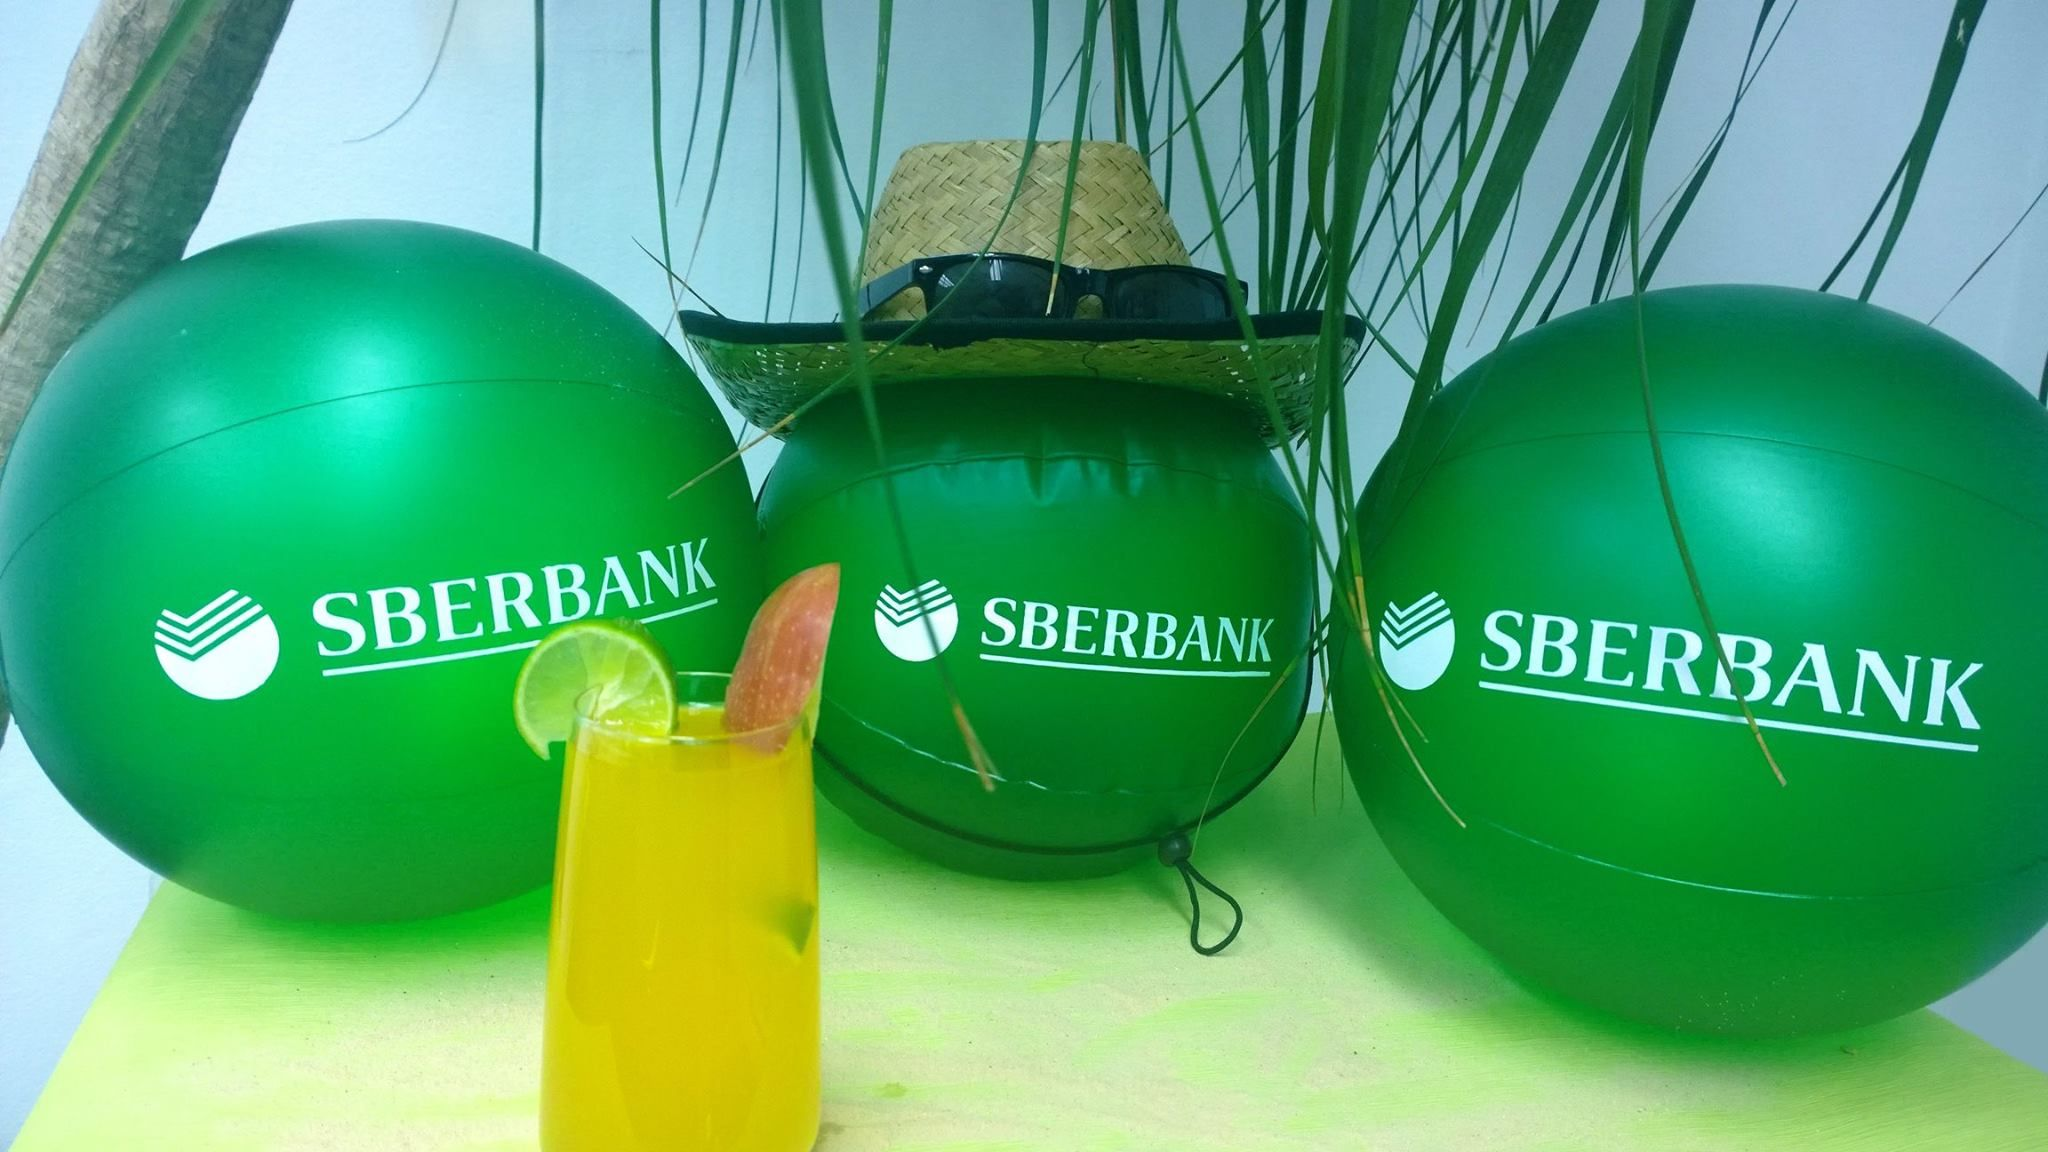 Sberbank Hrvatska - lopta, blok i kemijska (11. 08. 2014.)